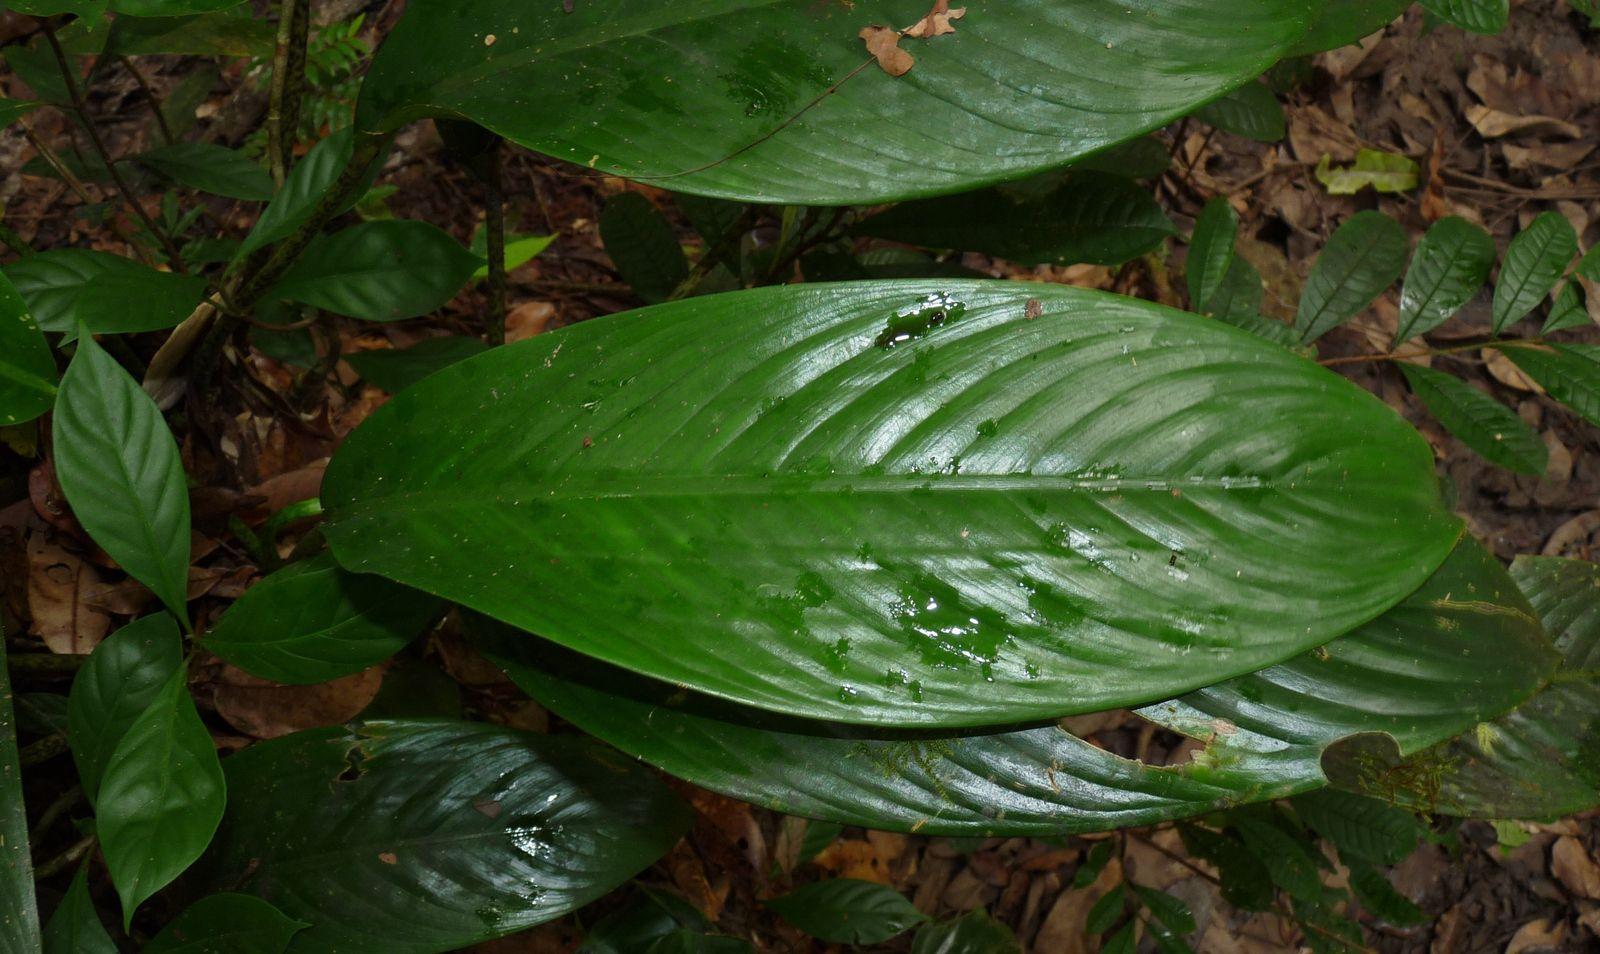 Dieffenbachia humilis